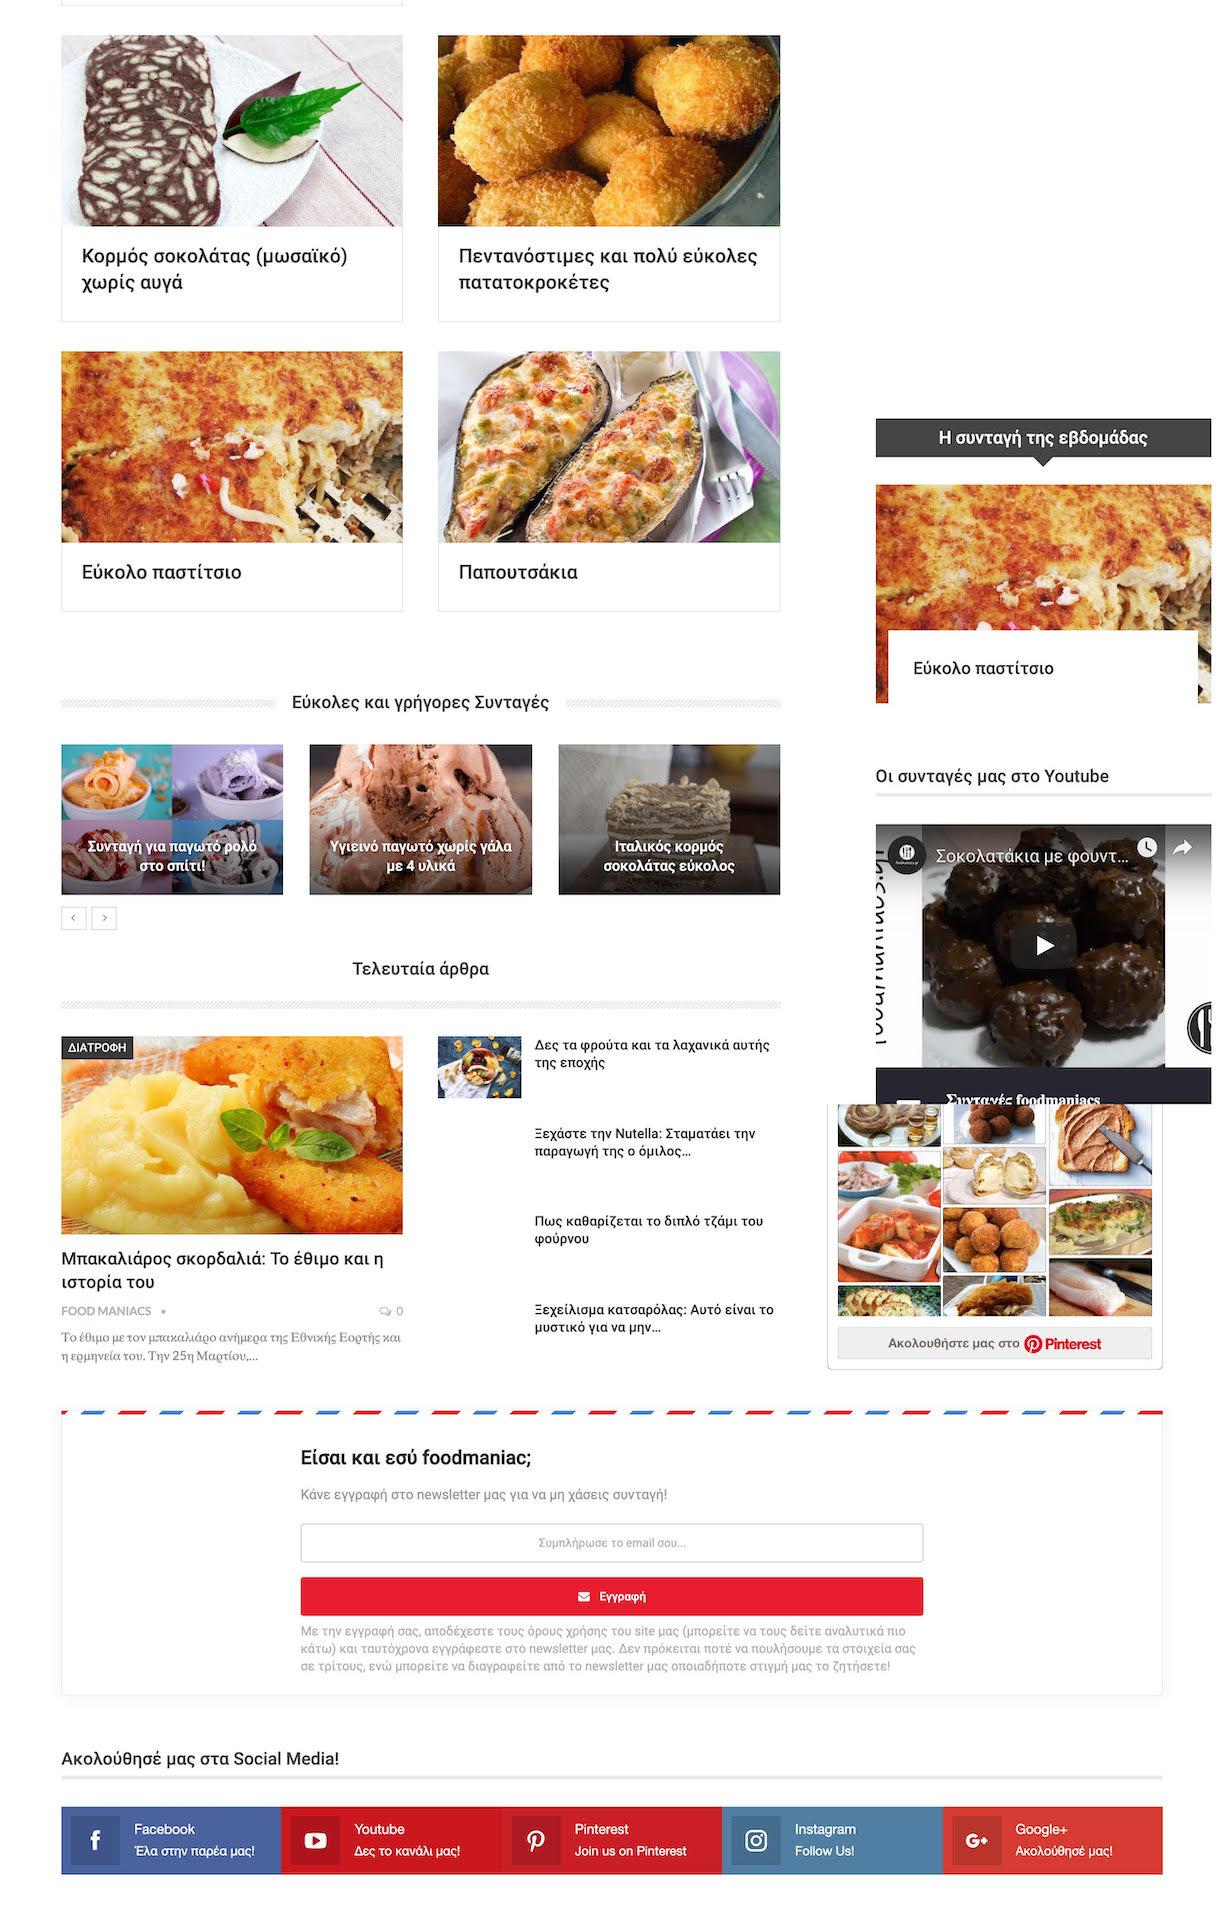 foodmaniacs homepage 2